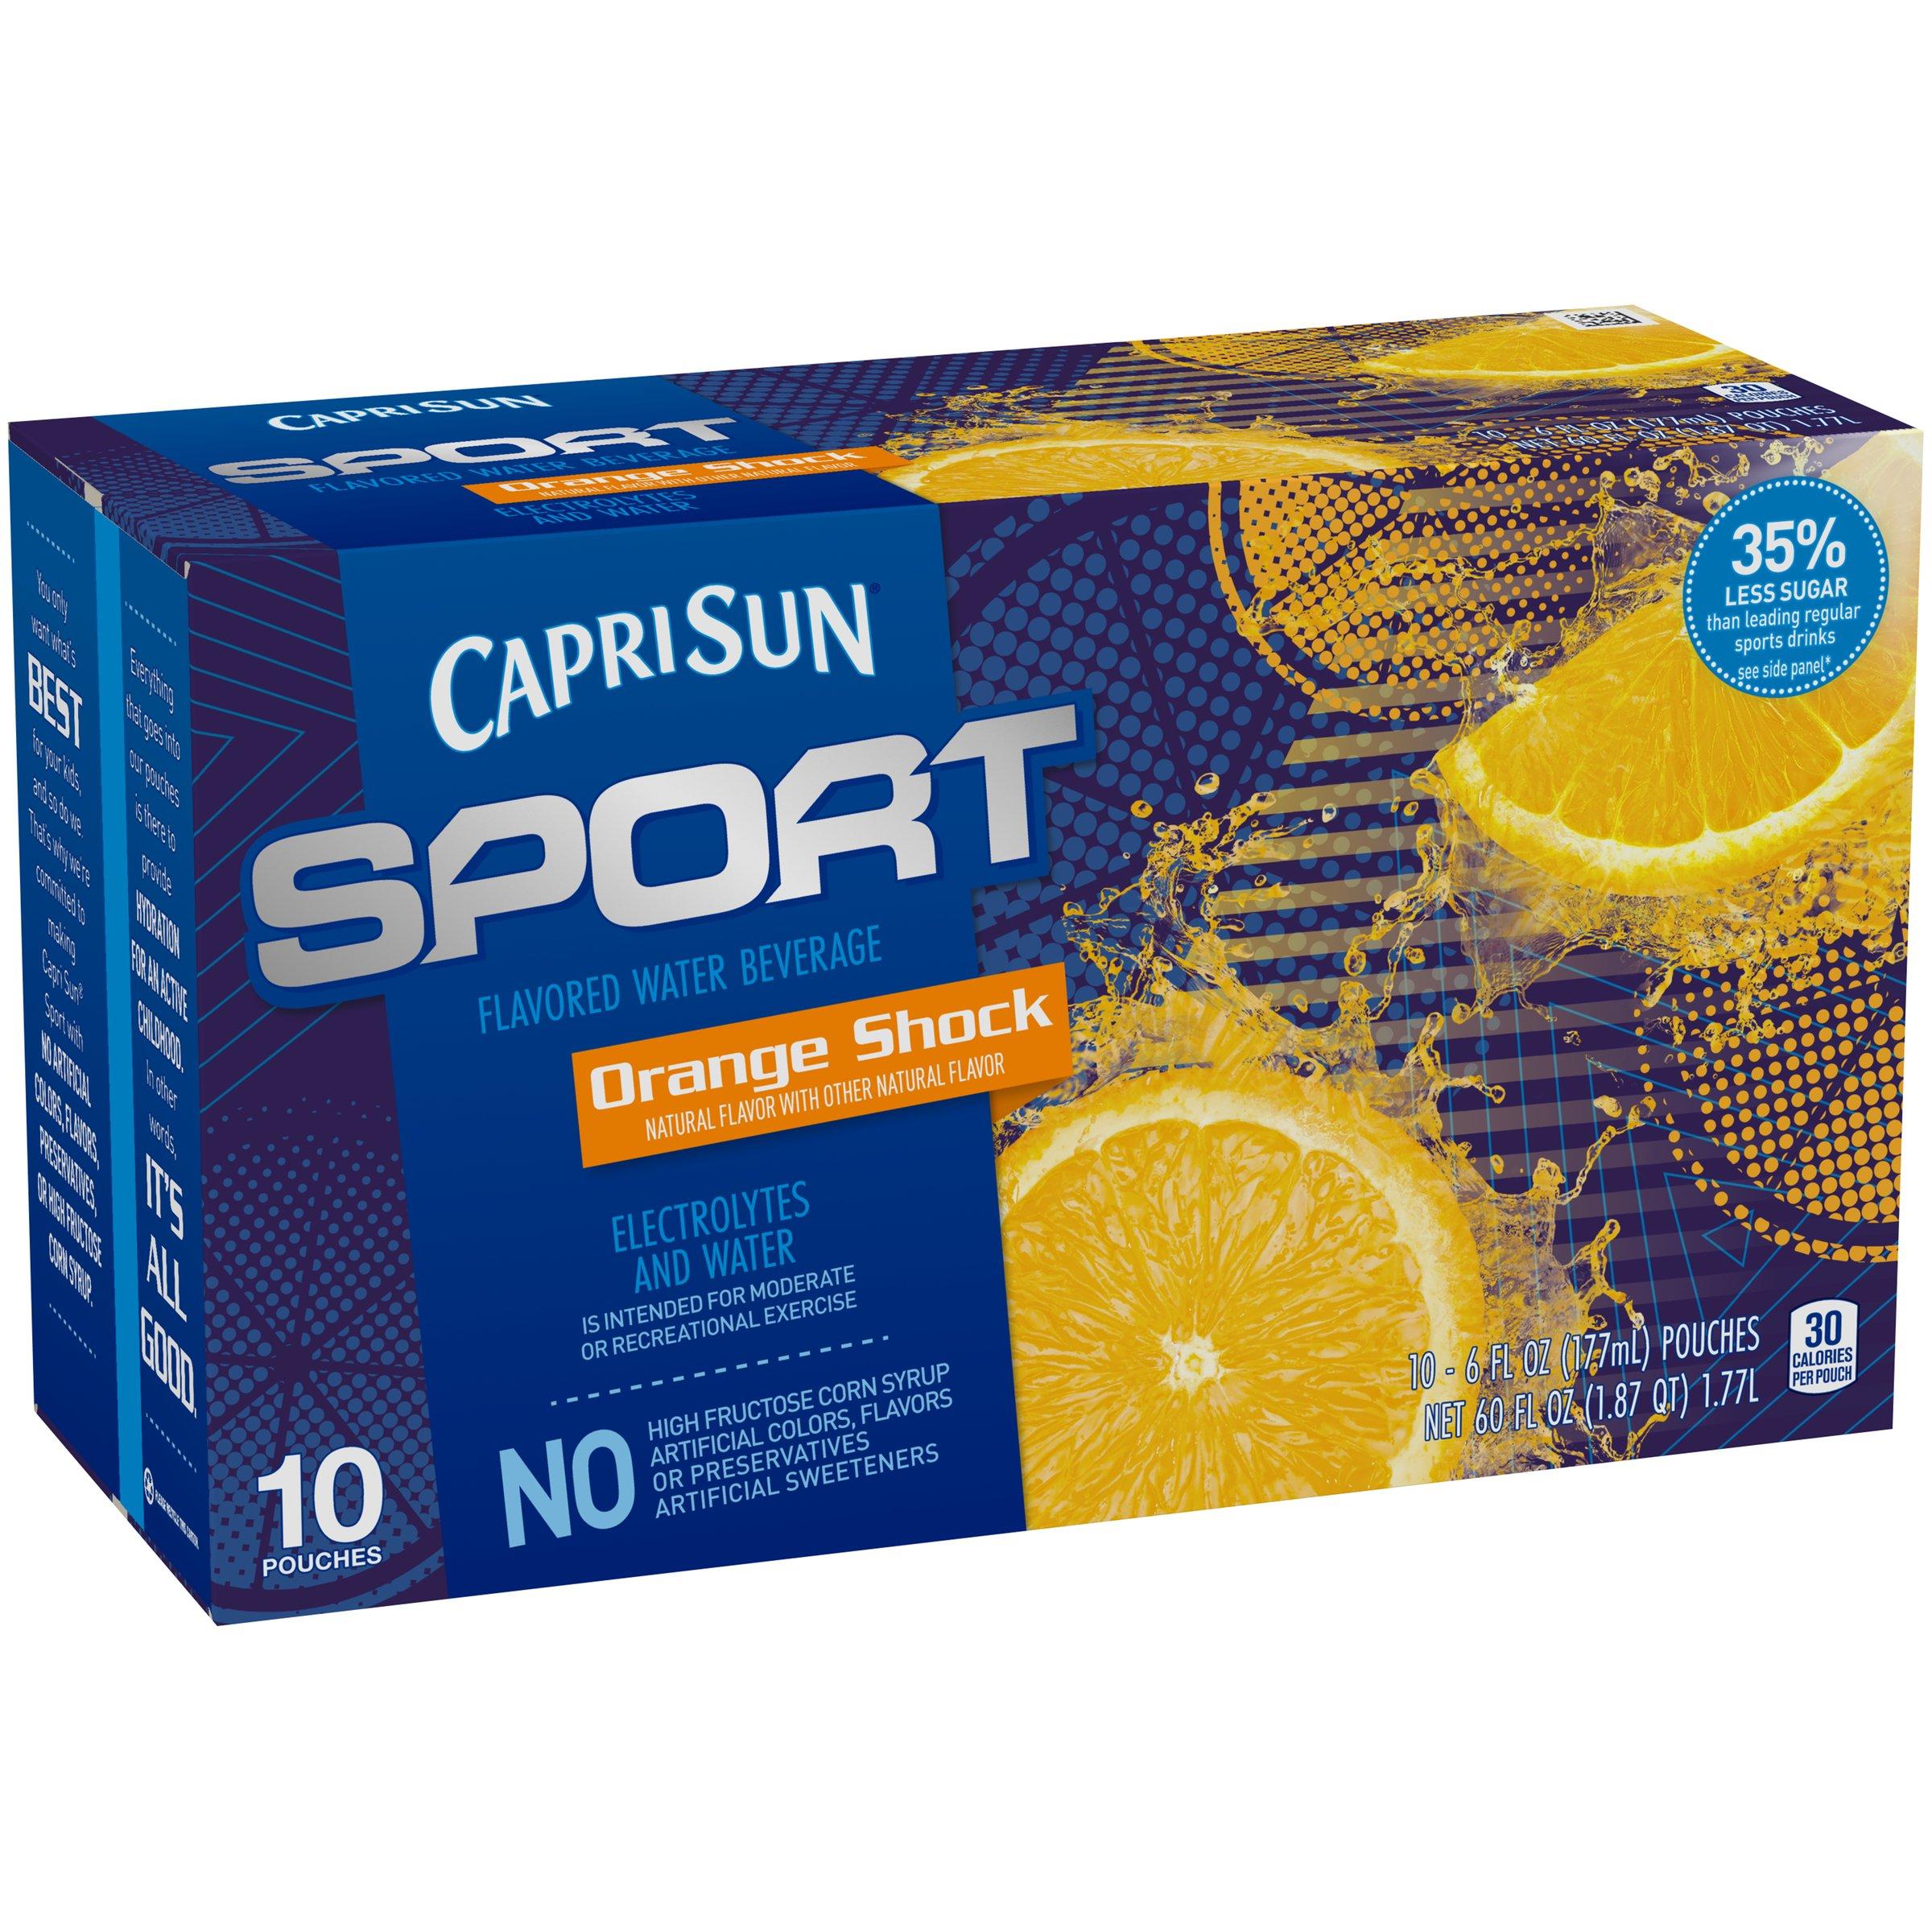 Capri Sun Sport Flavored Water Beverage, Orange Shock, 10 Count, 60 Ounce (Pack of 4)